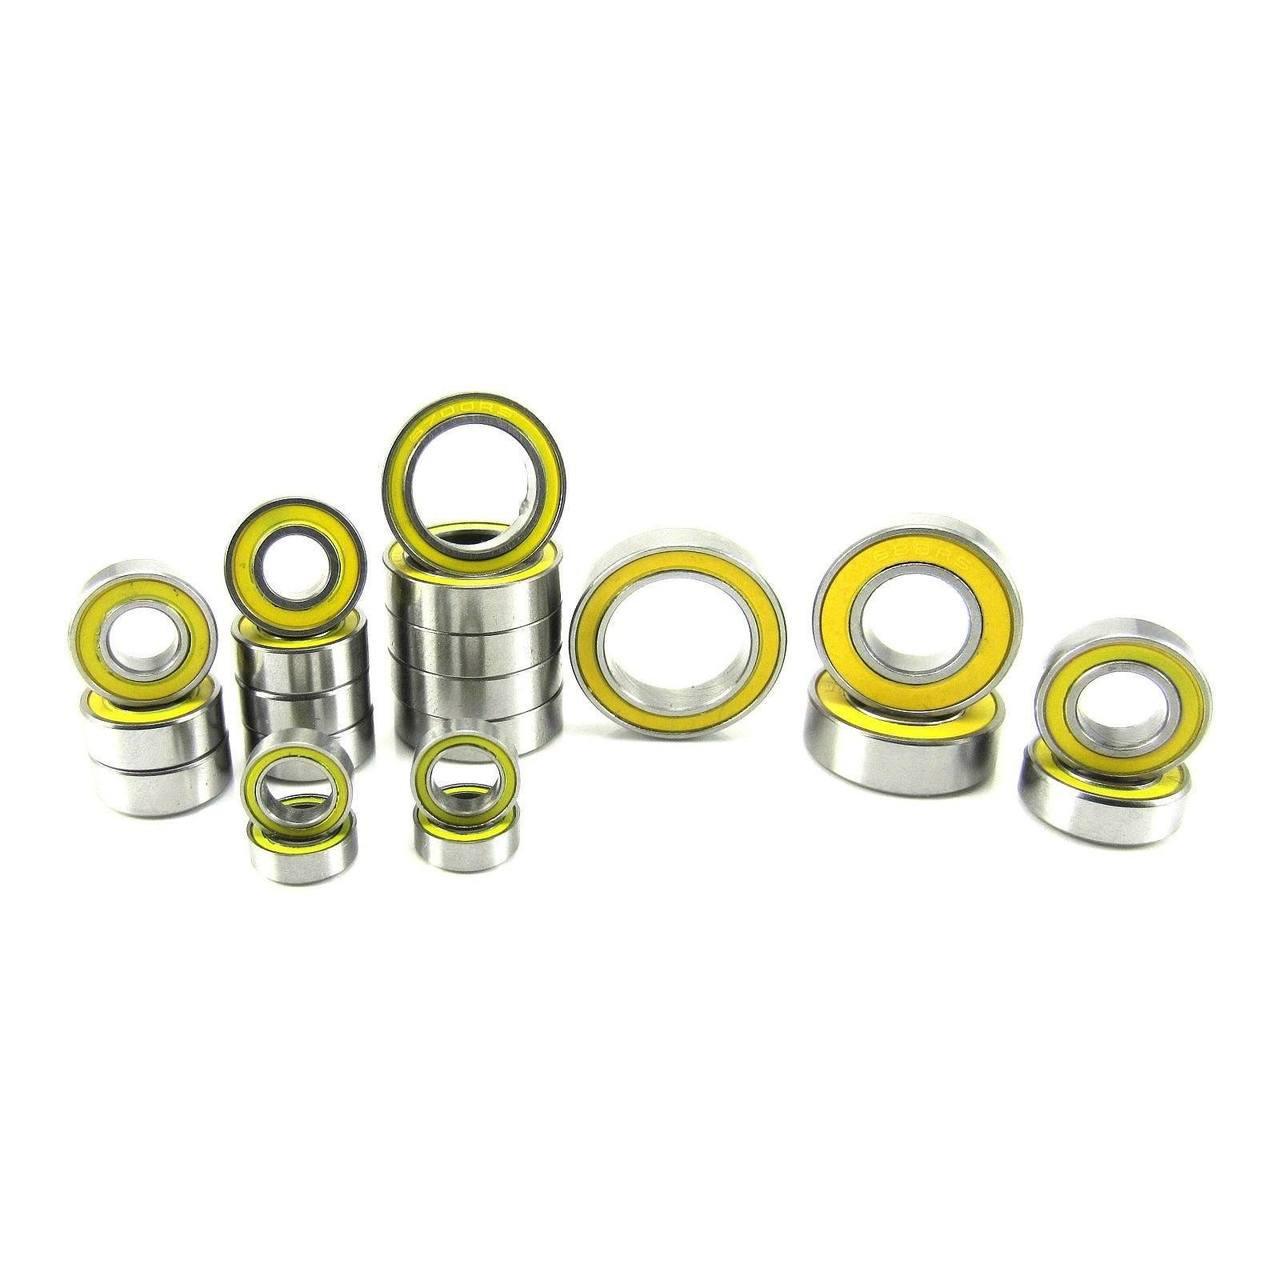 TRB RC Precision Ball Bearing Kit YEL (21) Rubber Sealed Traxxas Slash 4x4 VXL